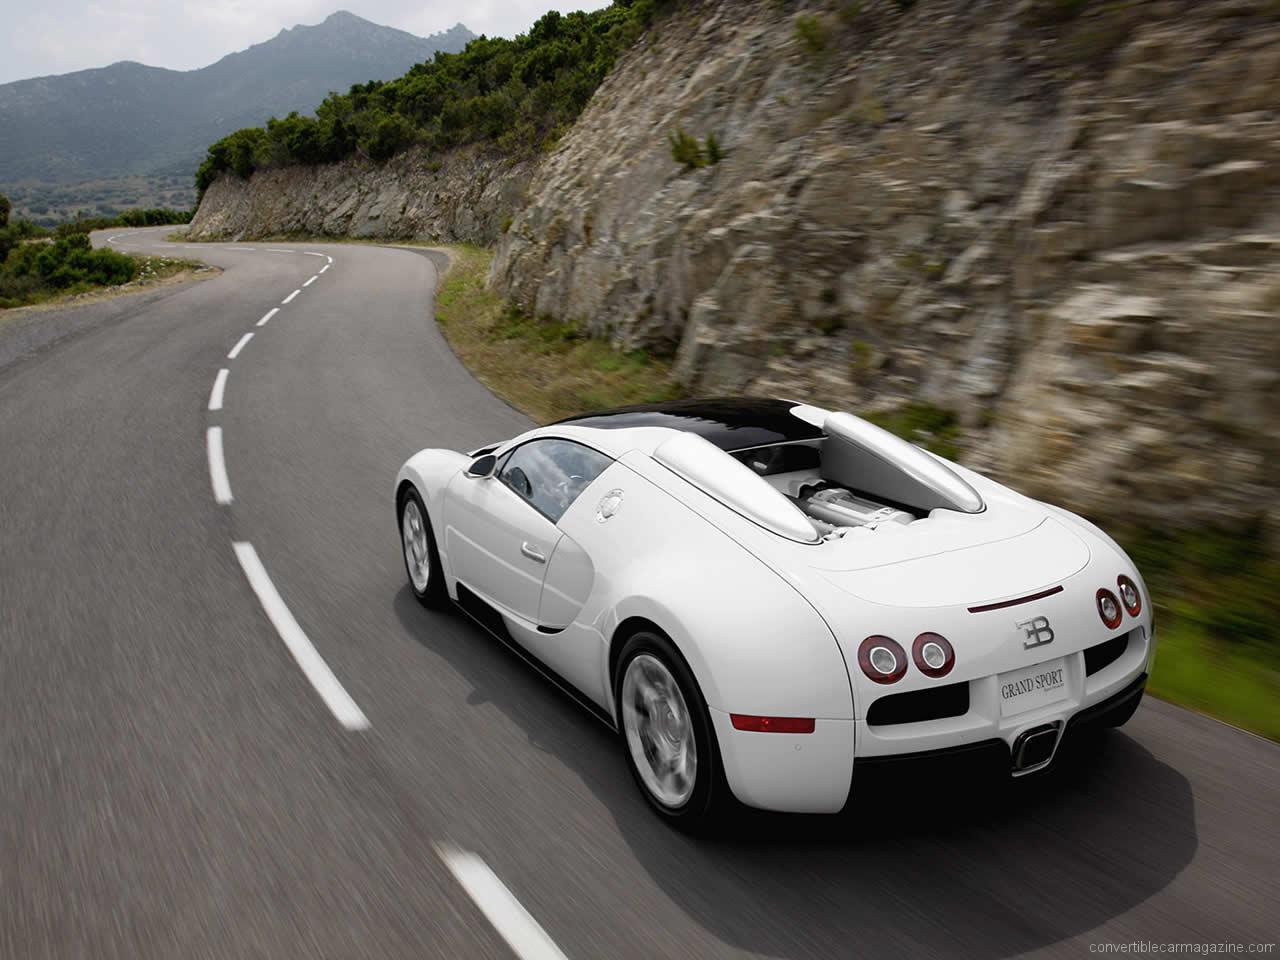 bugatti veyron grand sport buying guide. Black Bedroom Furniture Sets. Home Design Ideas